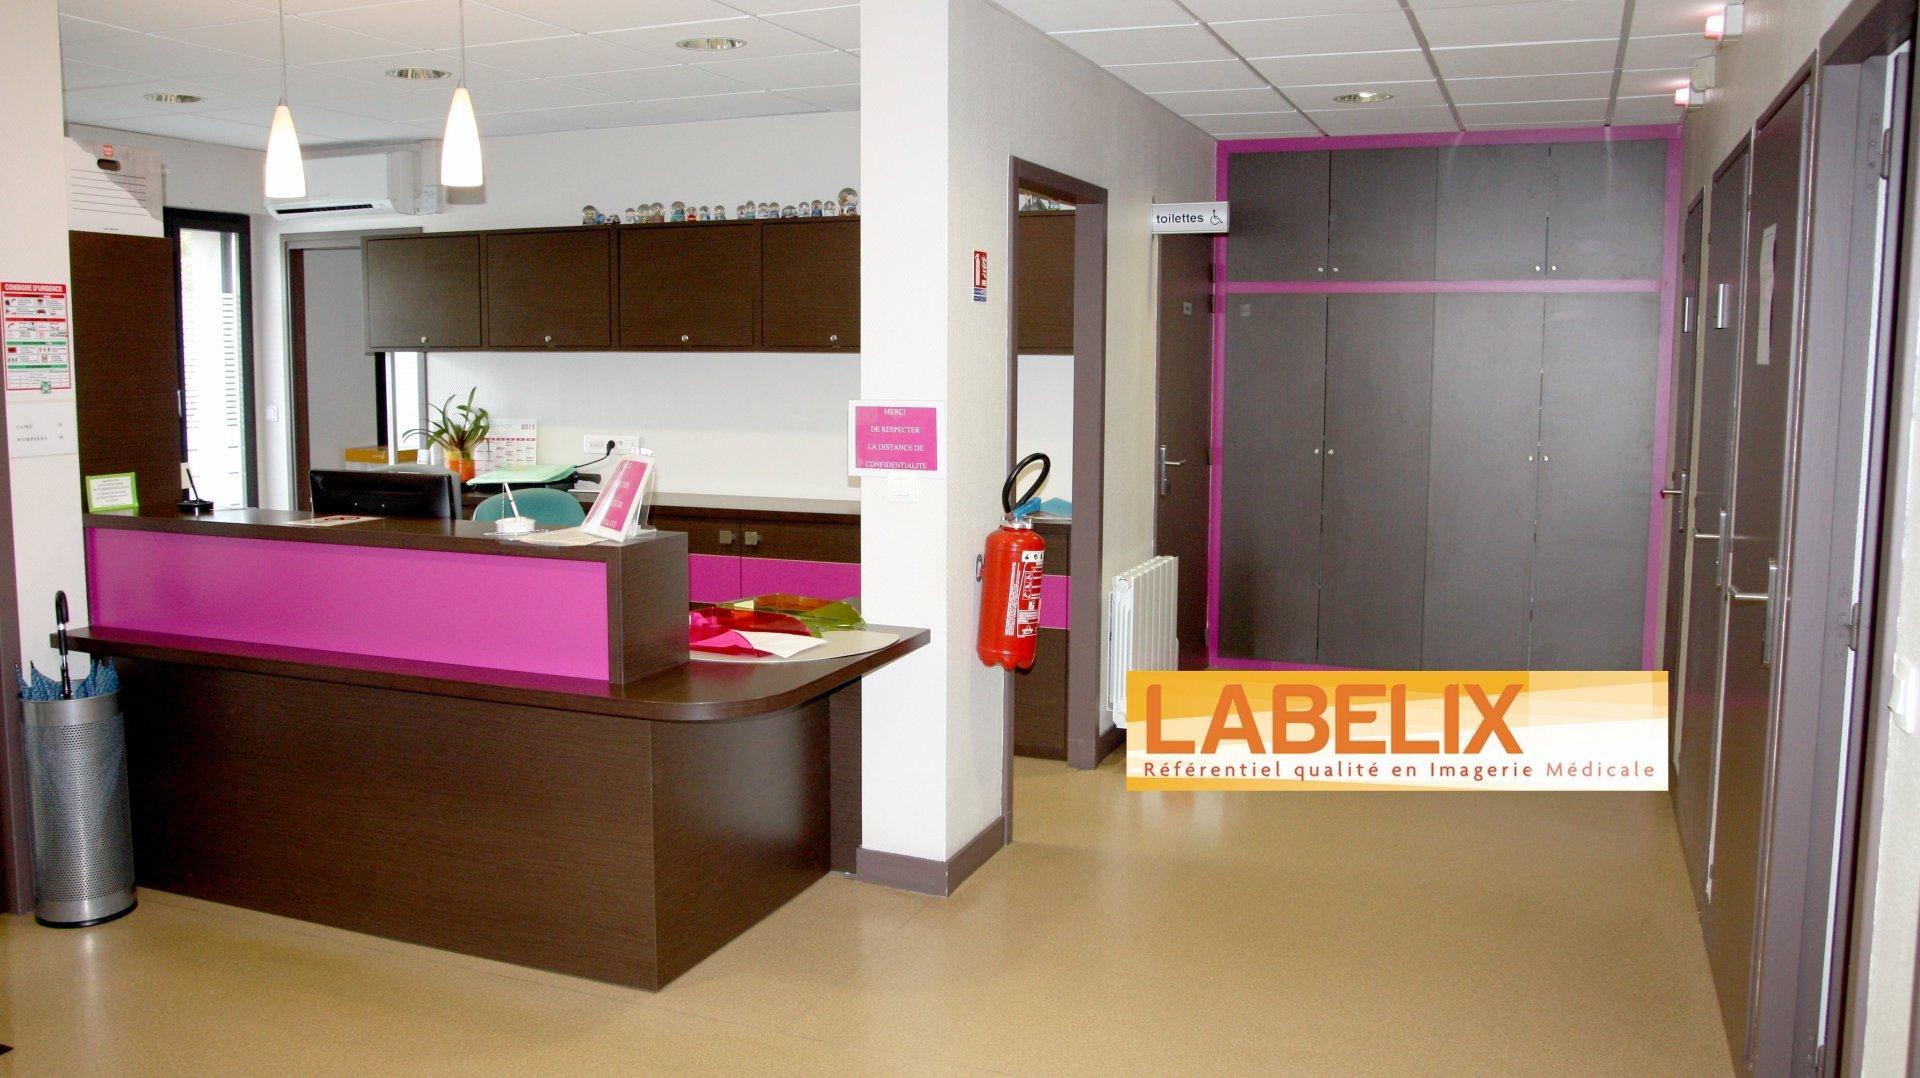 Cabinet radiologie hennebont - Cabinet de radiologie lorient ...